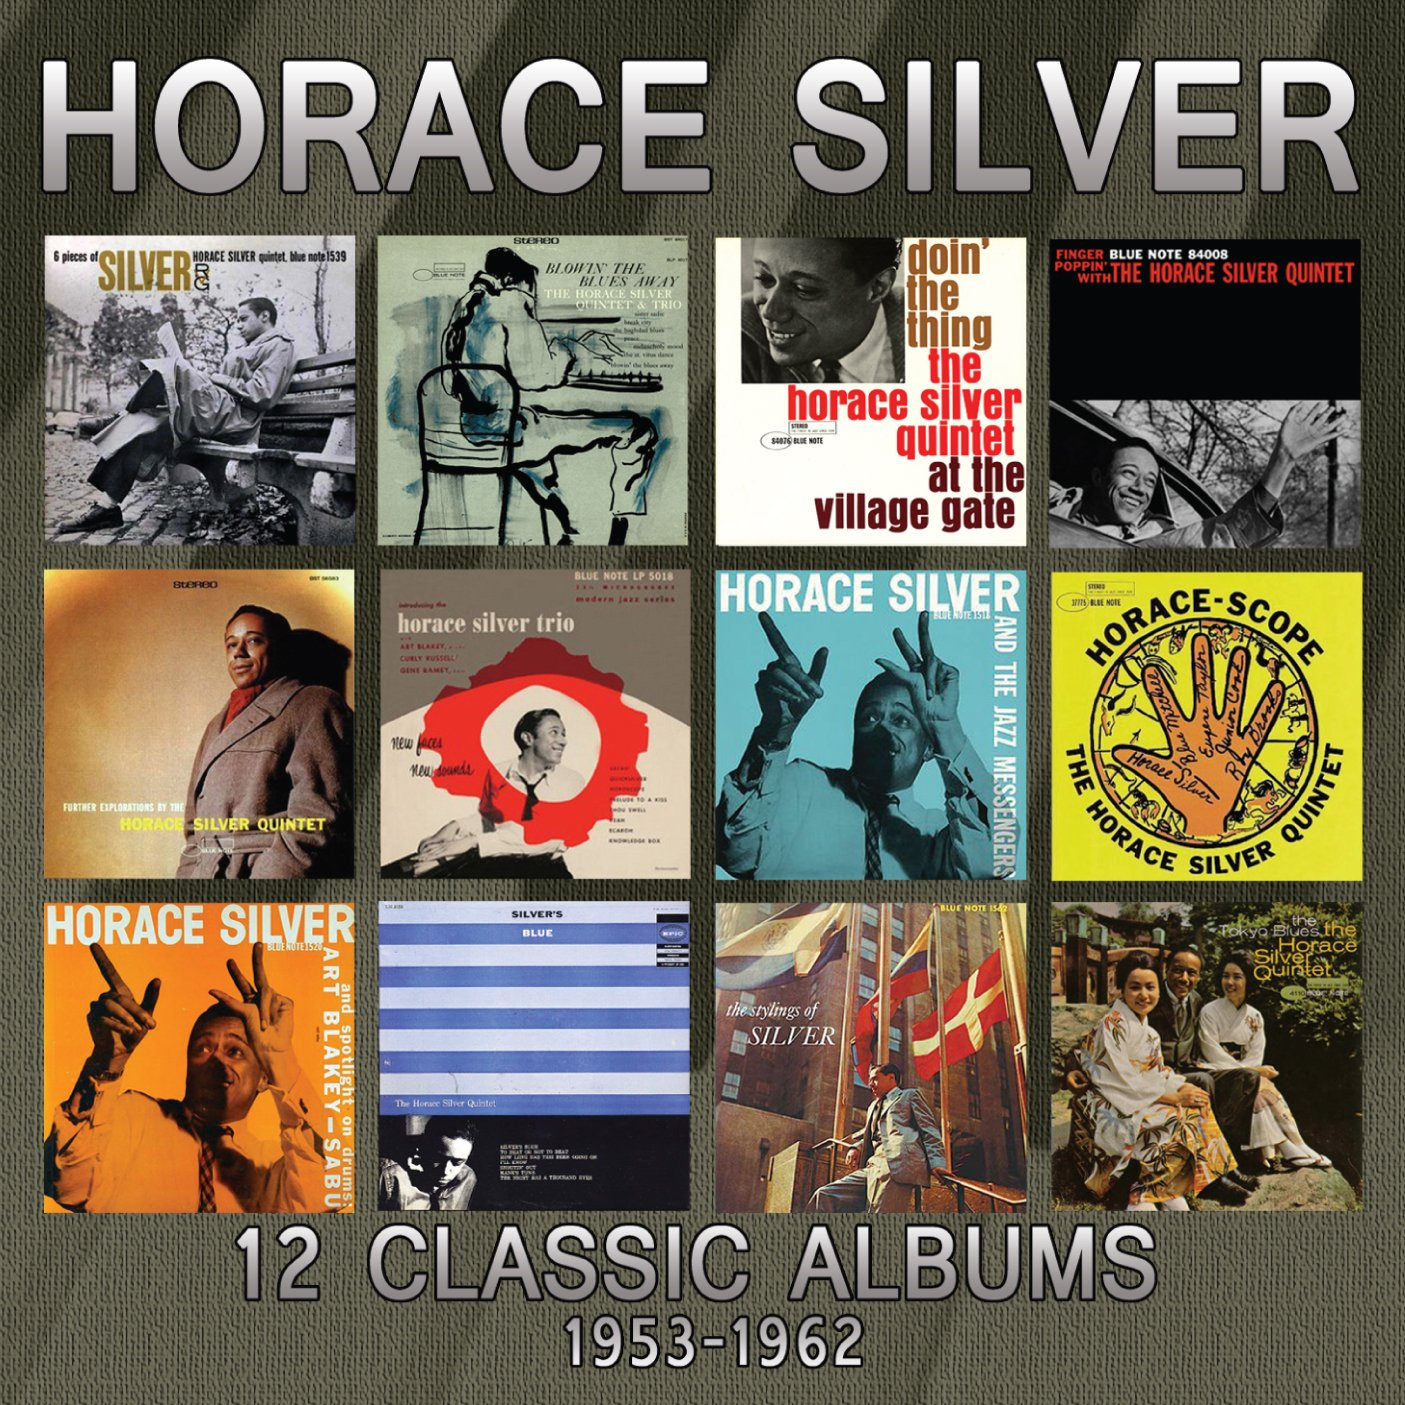 12 Classic Albums: 1953-1962 (6CDs)